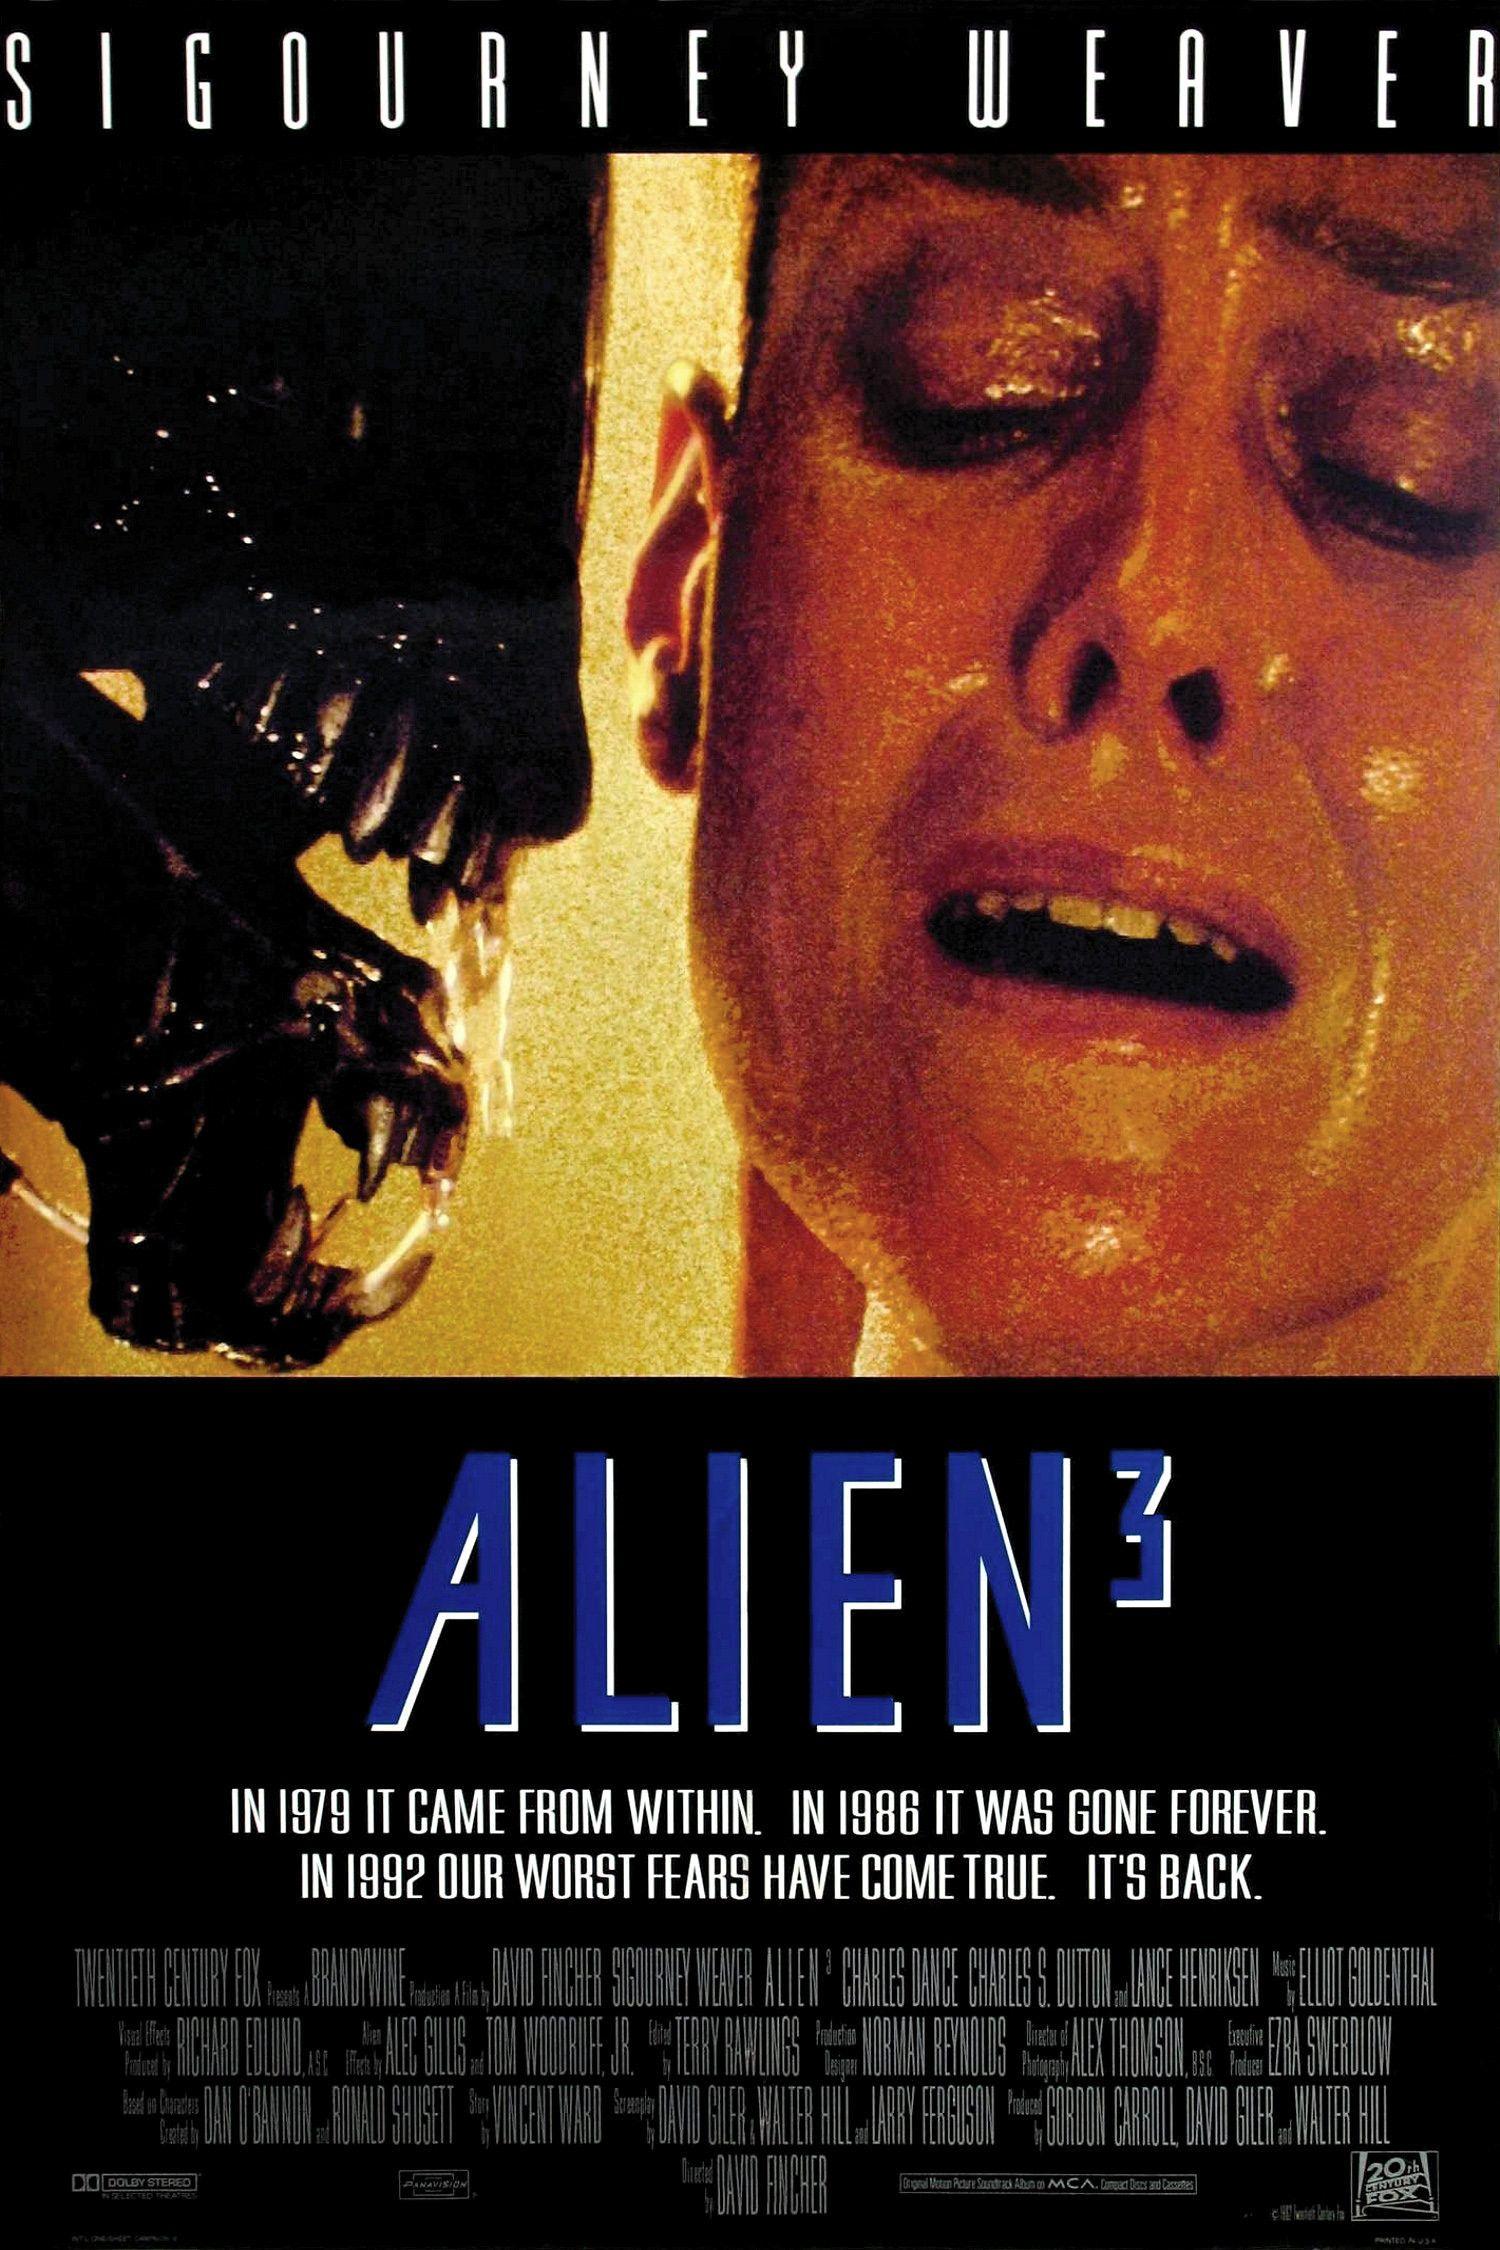 Alien 3 dc aliens movie movie posters sci fi horror movies